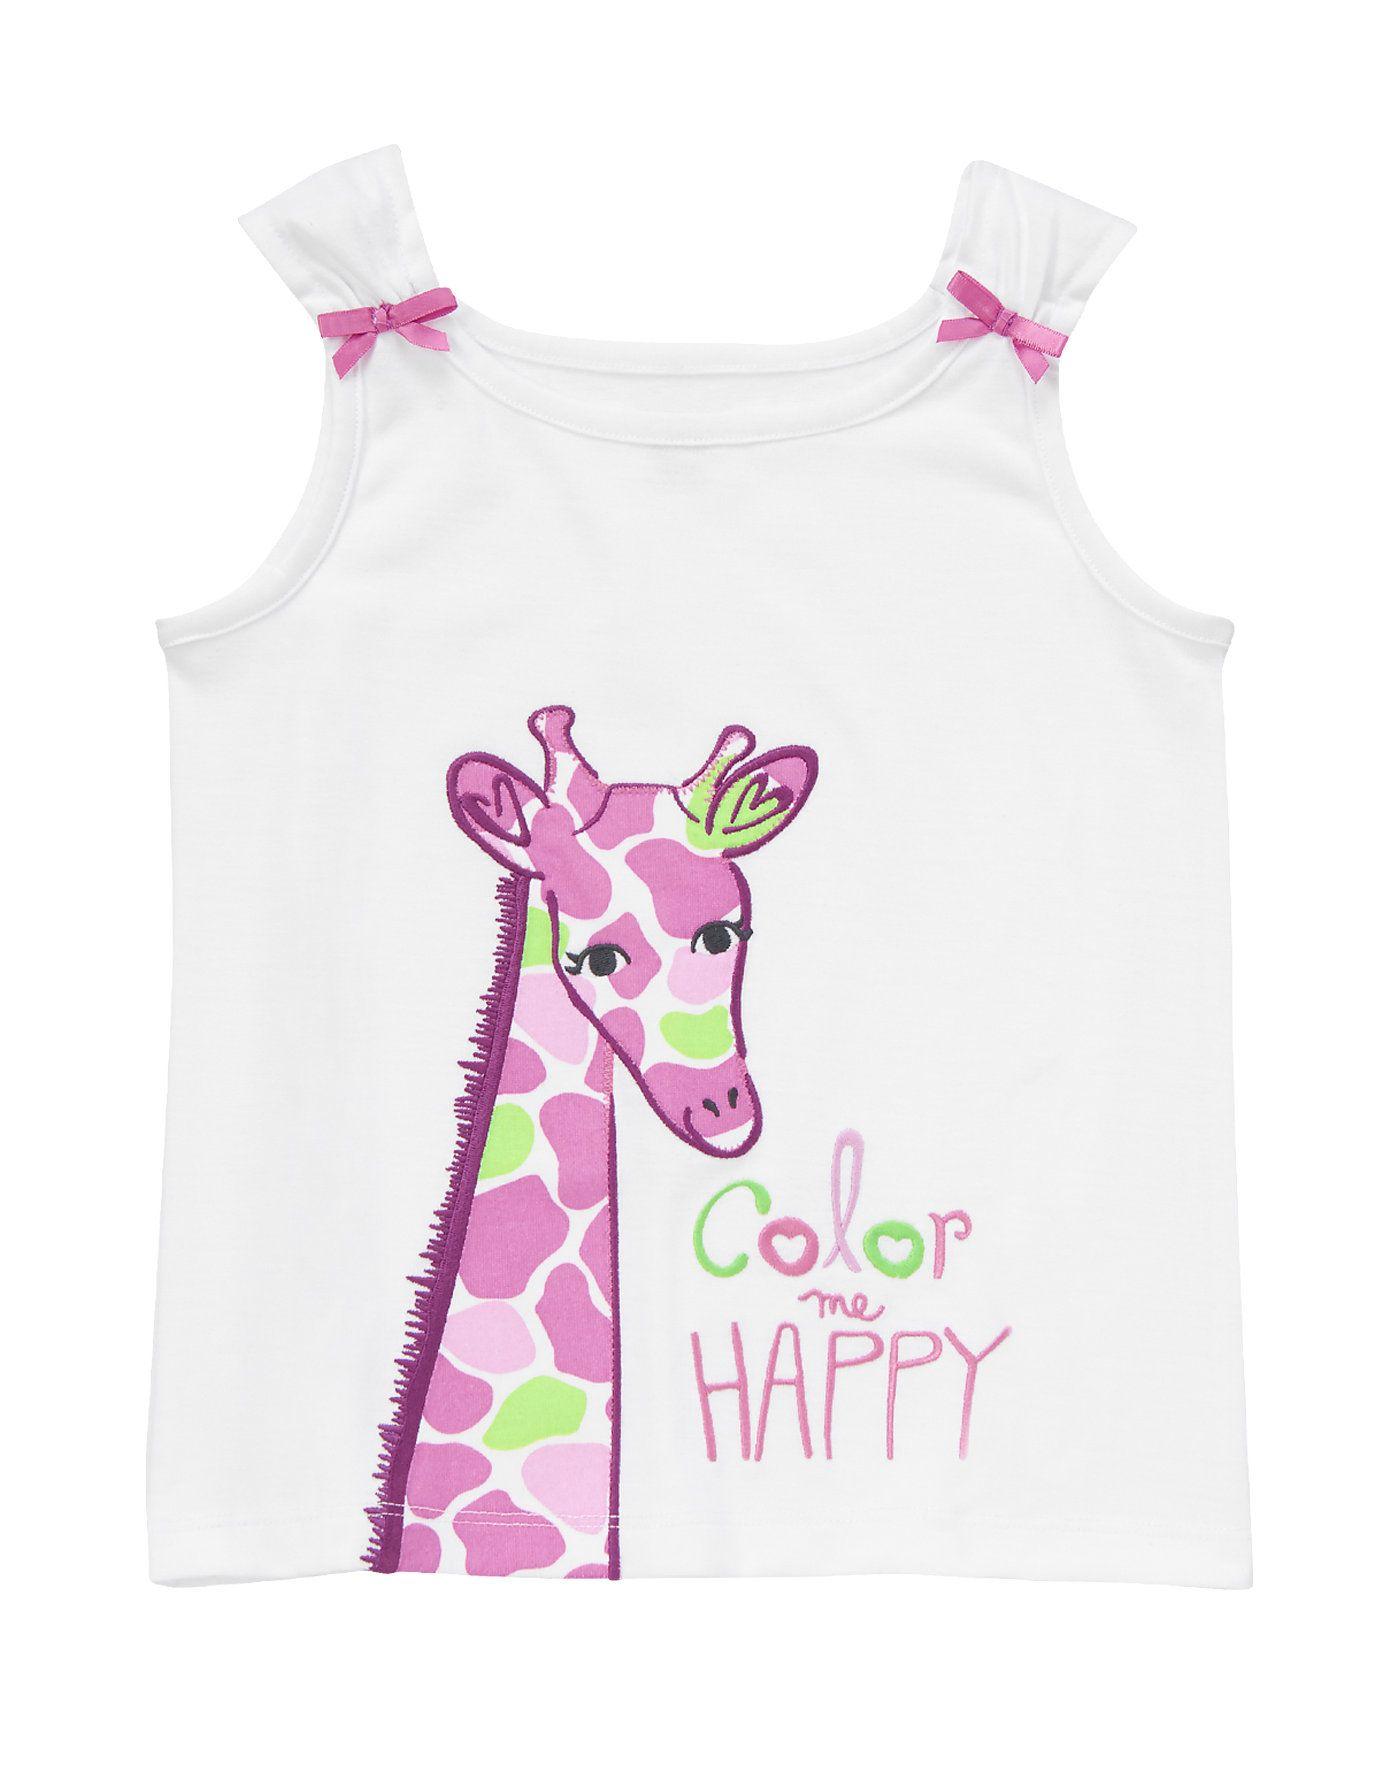 Color Me Happy Sleep Tank at Gymboree SLEEPWEAR